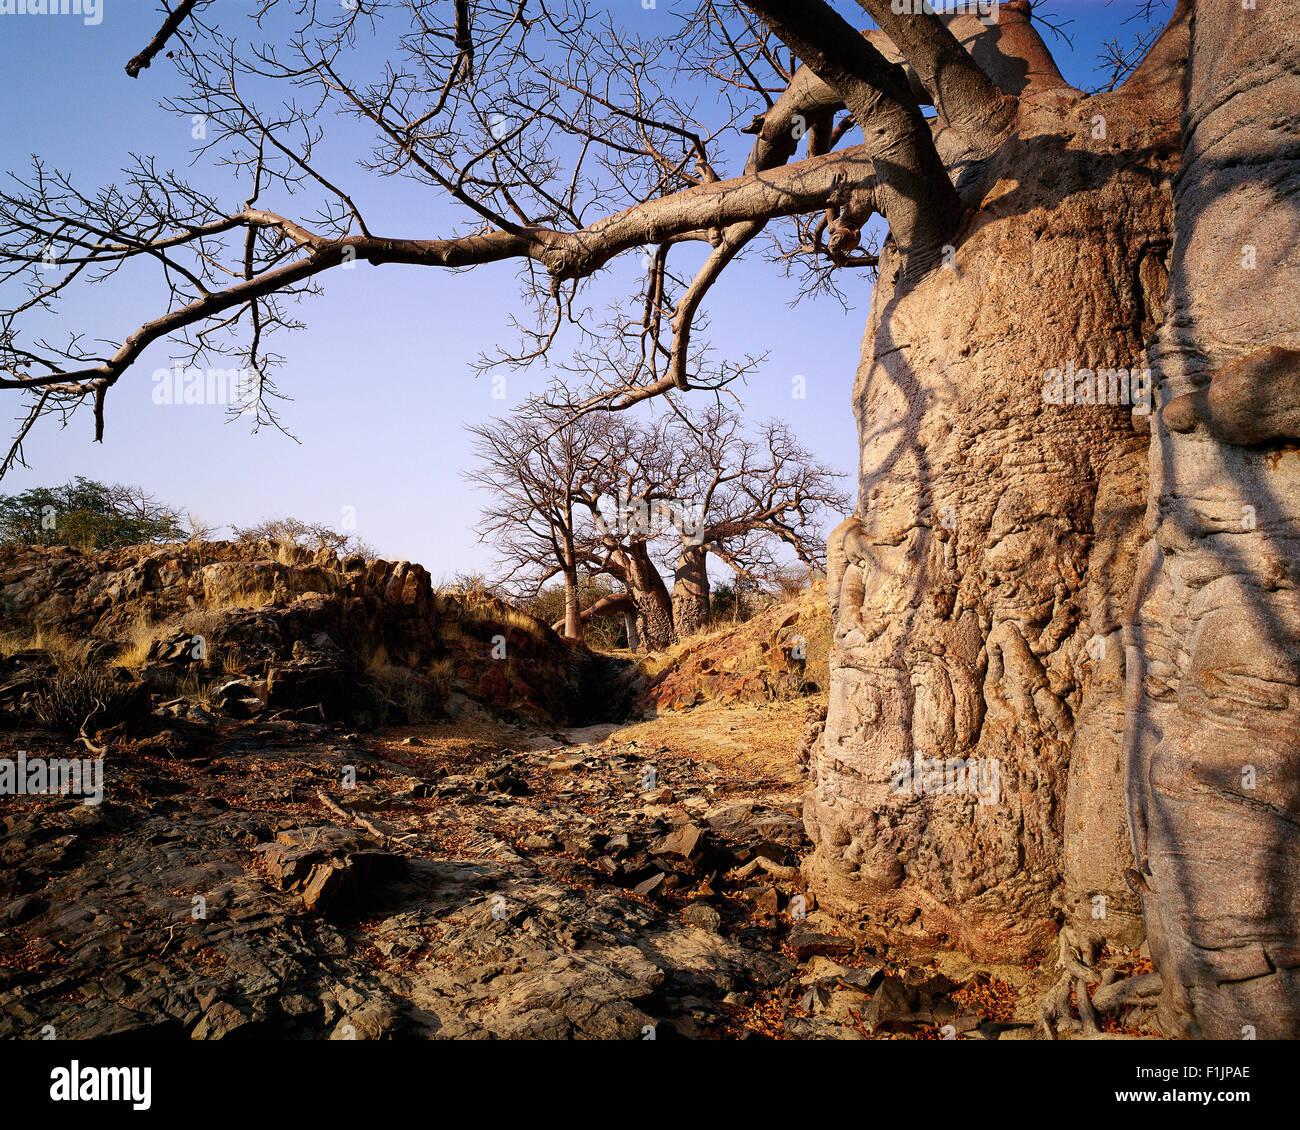 Baobab Tree near Kunene River Epupa Falls, Angola, Africa - Stock Image